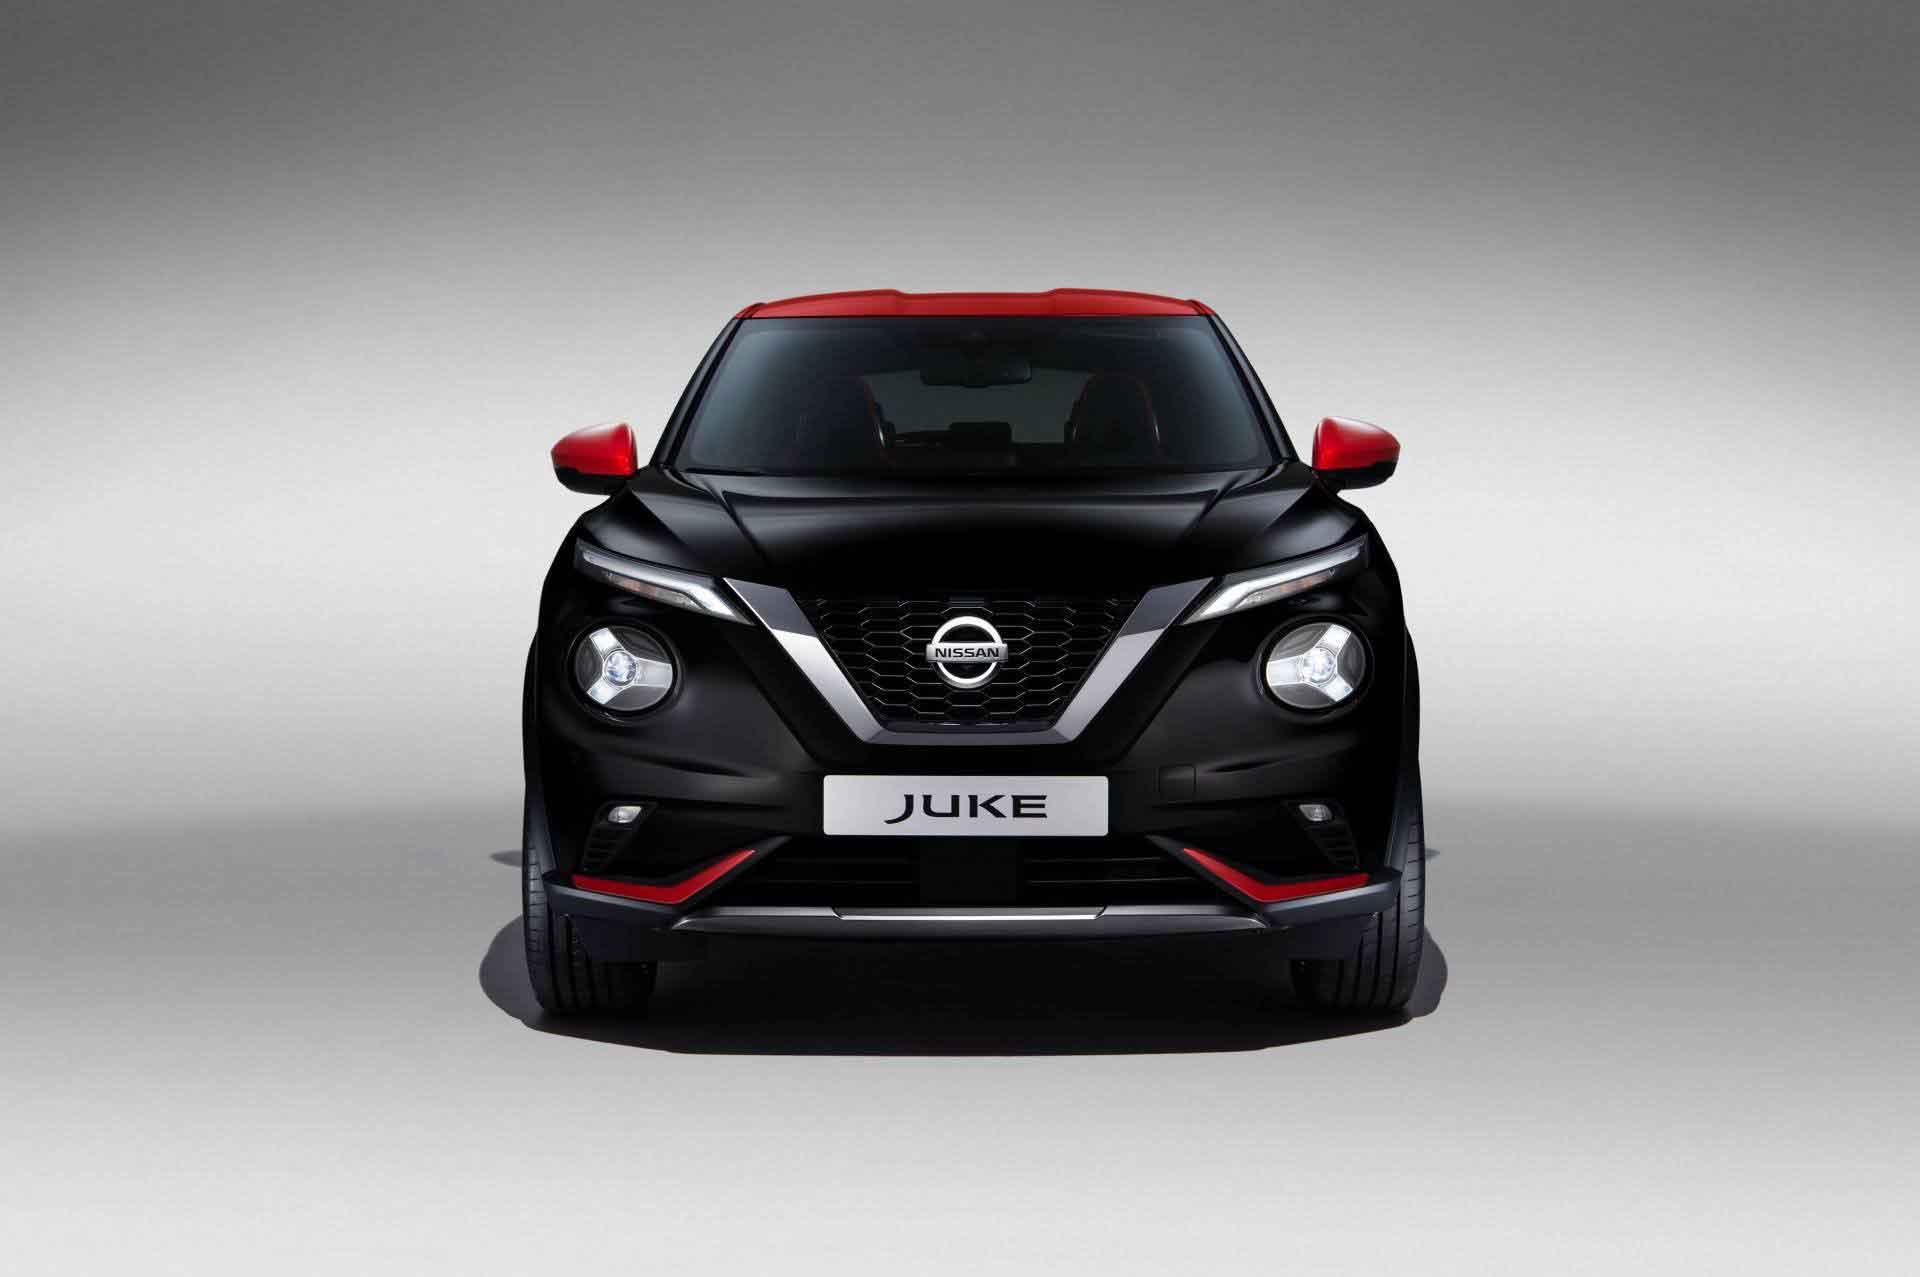 Nissan juke 2020: фото, цена, комплектации, старт продаж в россии